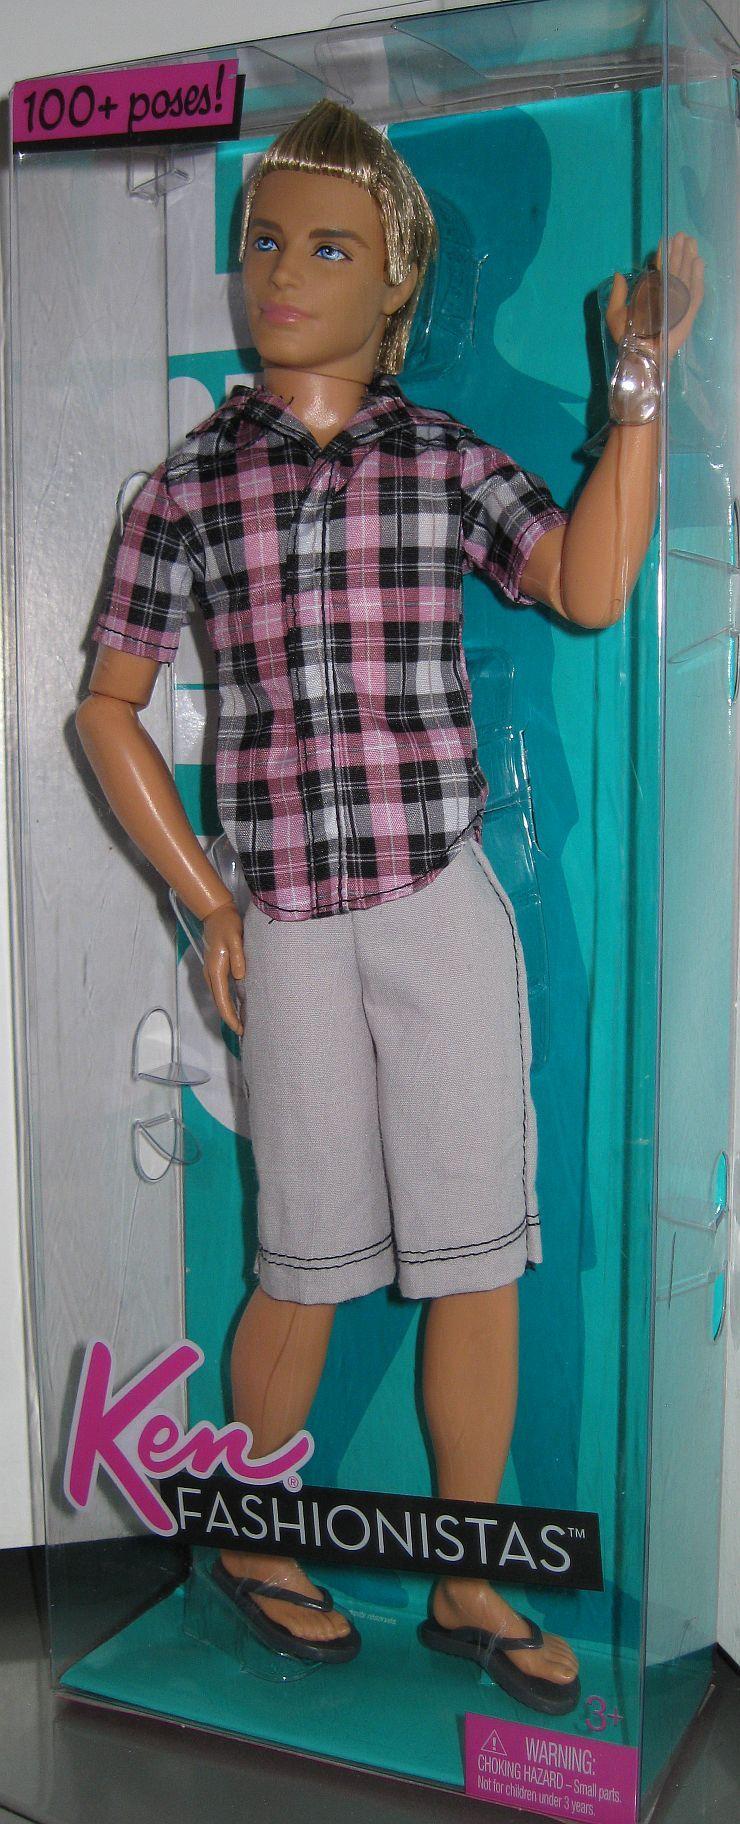 Fashionistas Ken